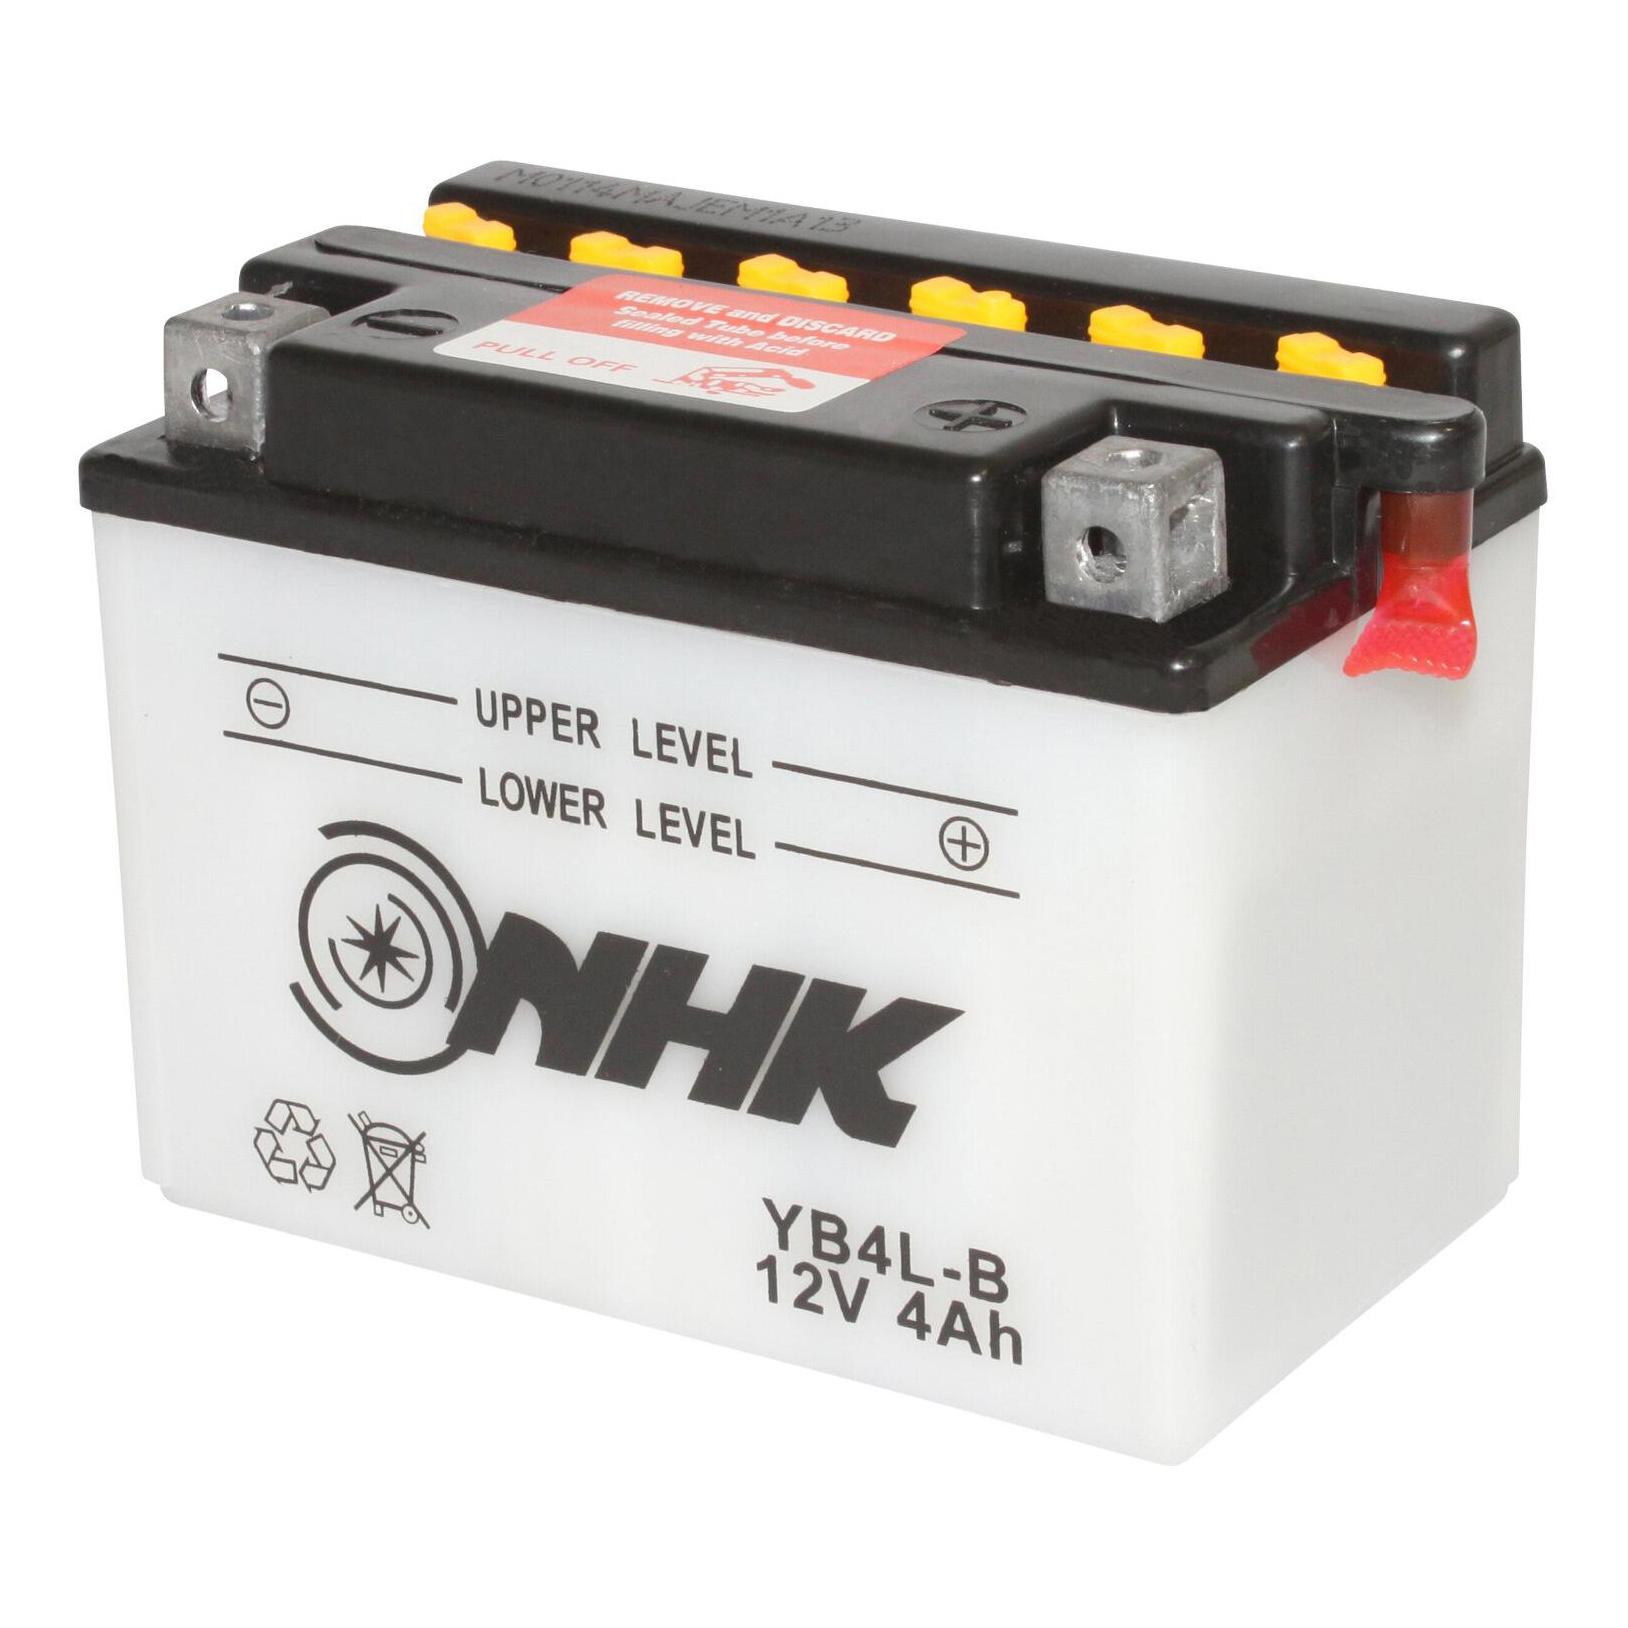 Batterie NHK YB4L-B 12V 4Ah avec entretien